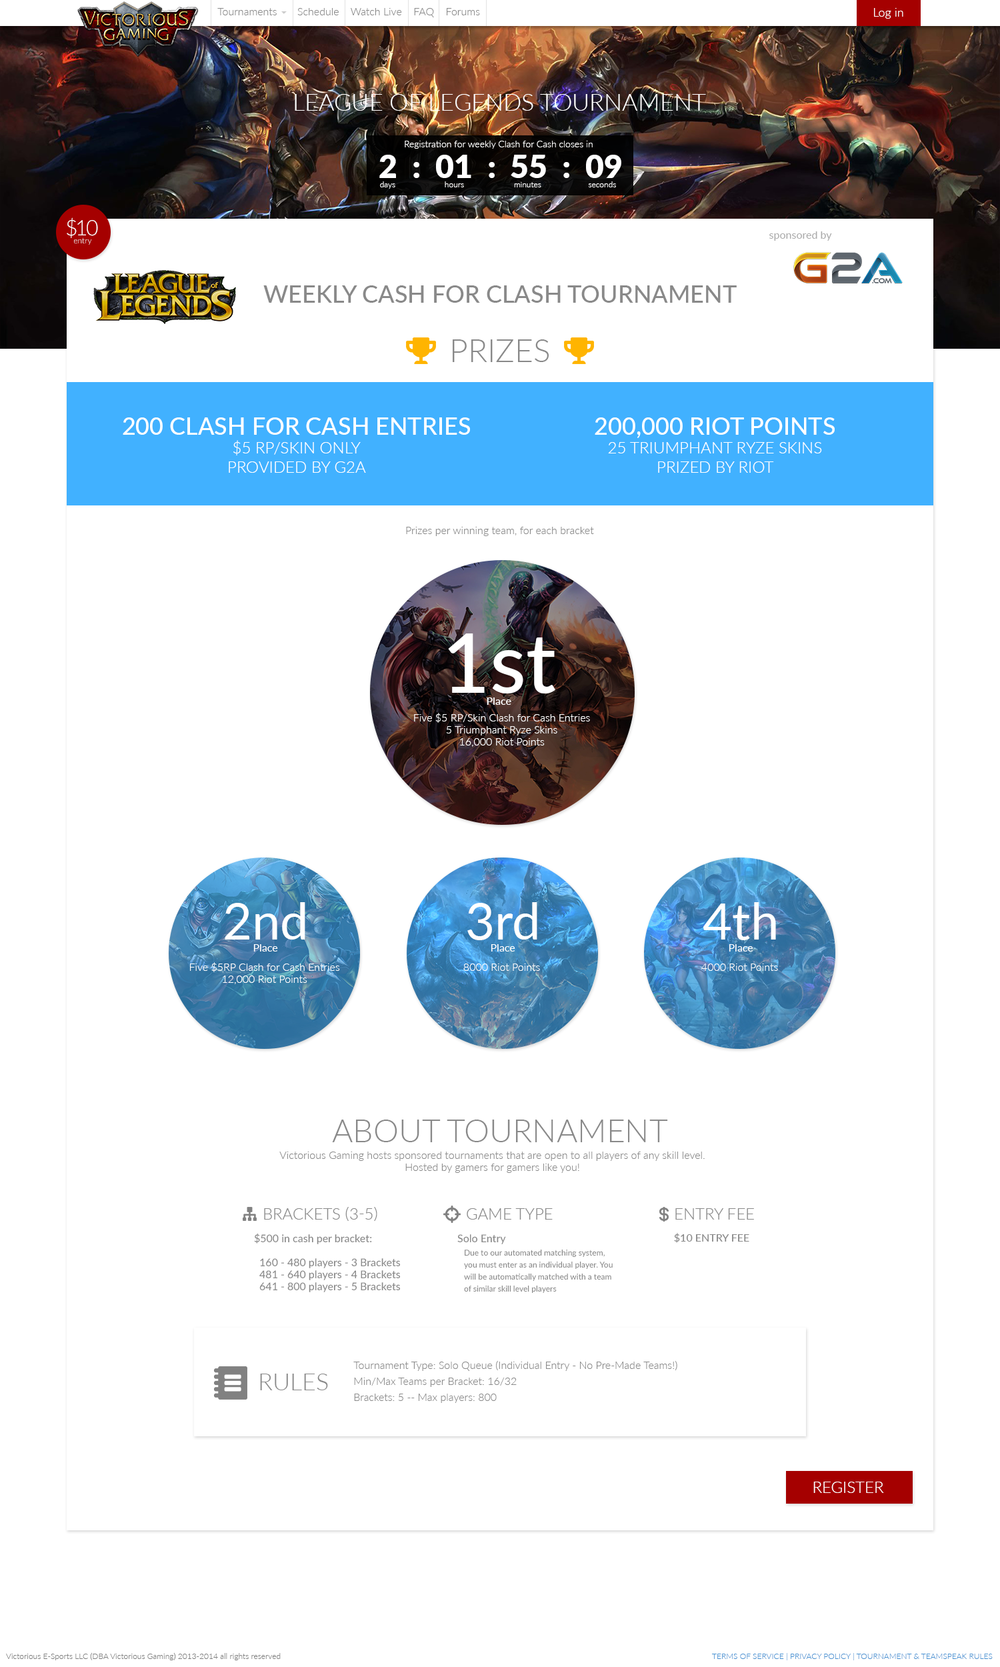 Tournament feedback